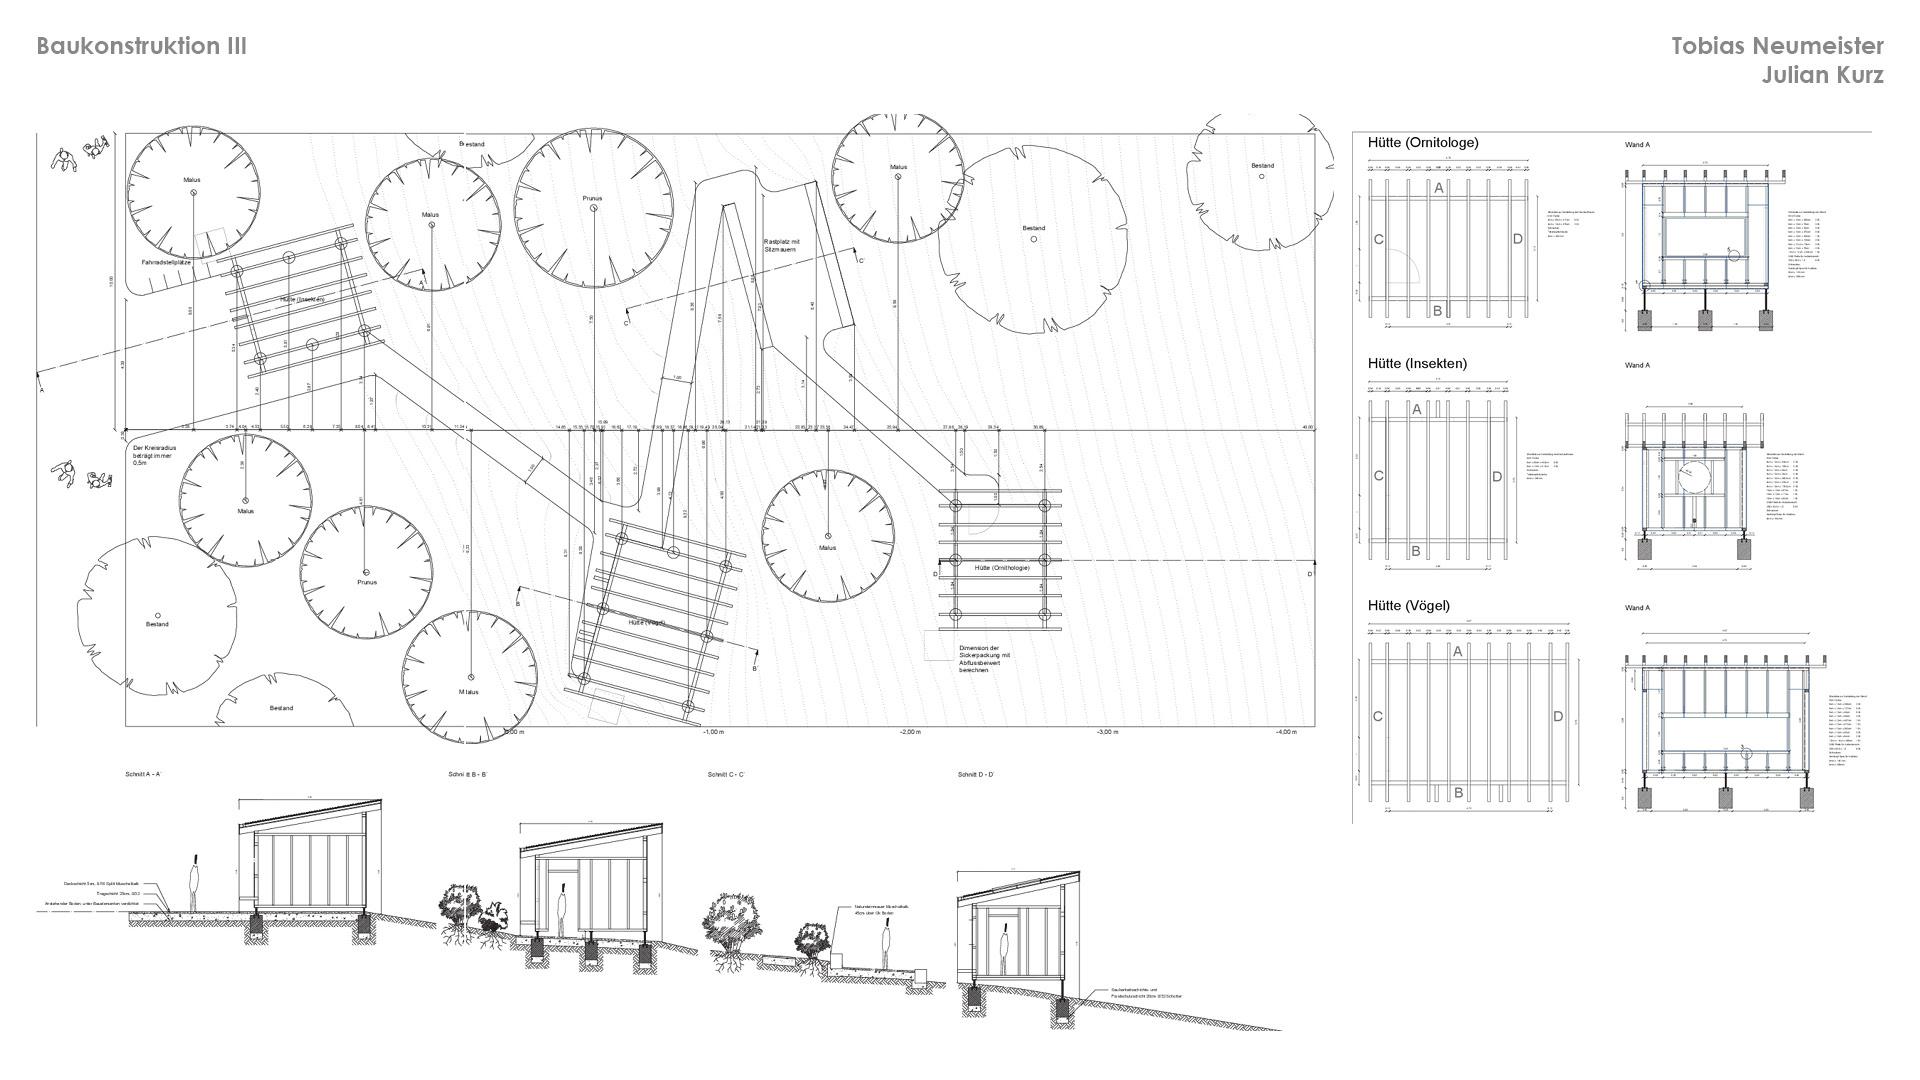 05 2013 3 BaukonstruktionIII